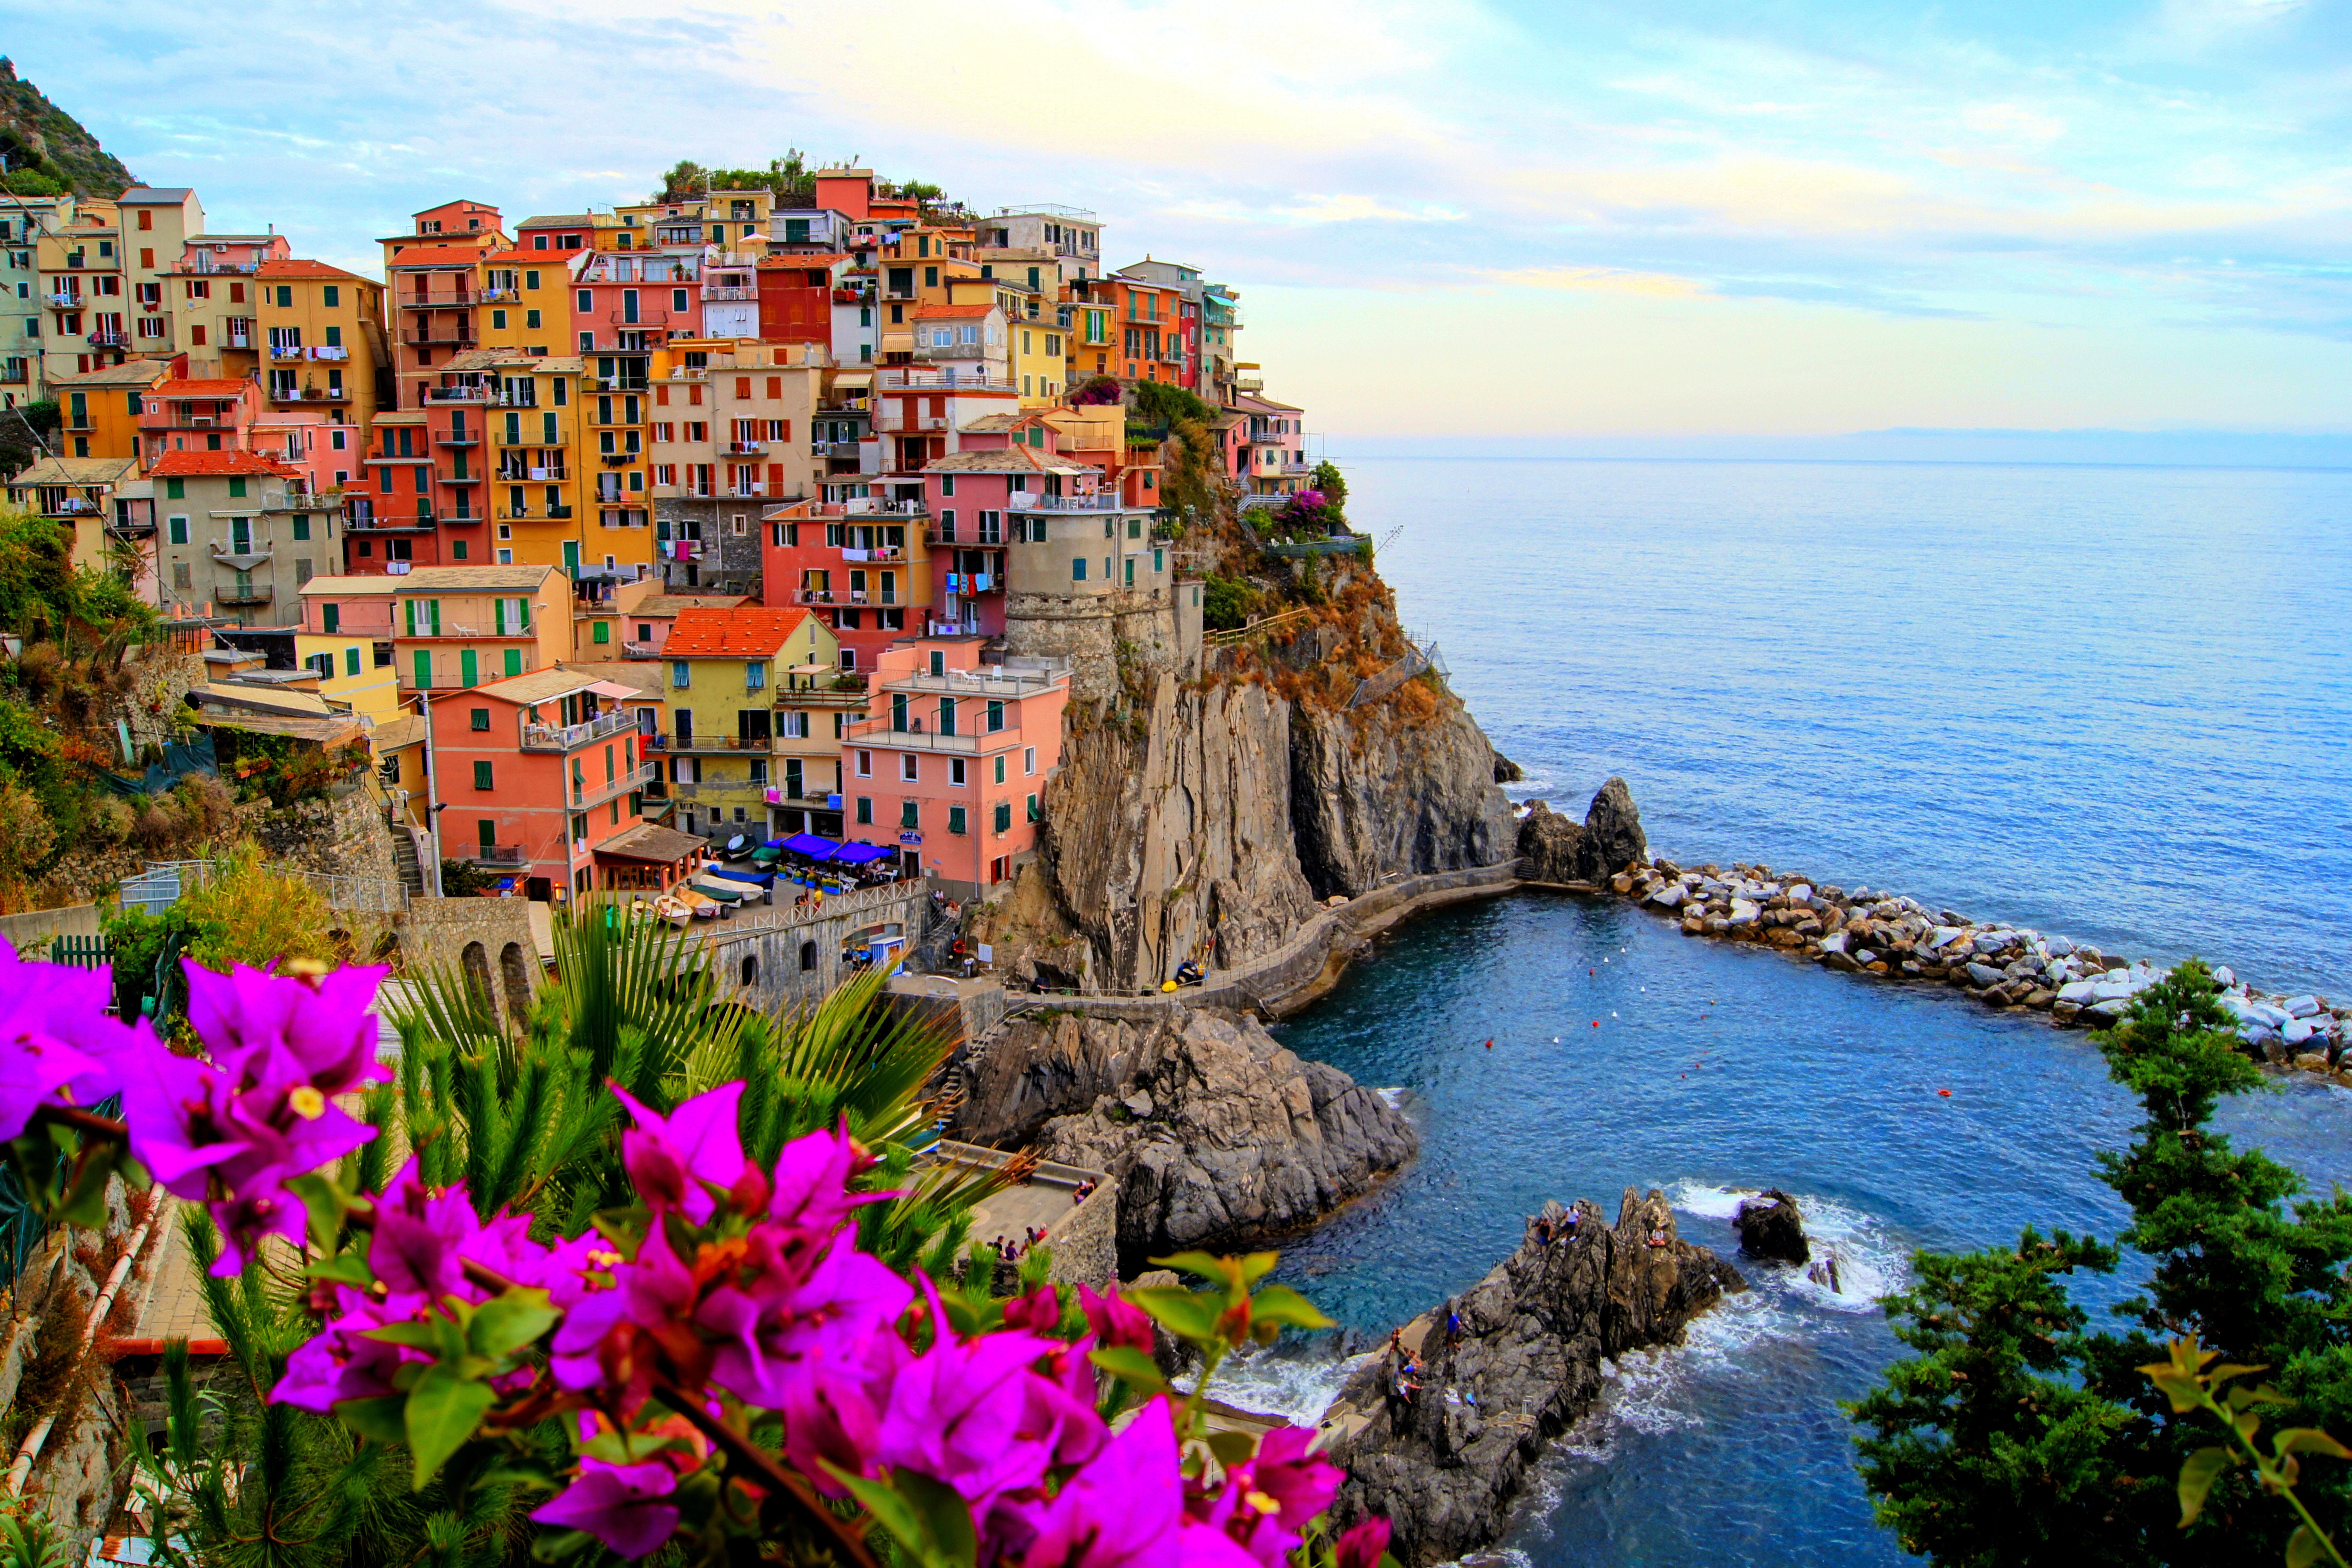 Download wallpaper vernazza italya city sea desktop 8820x5880